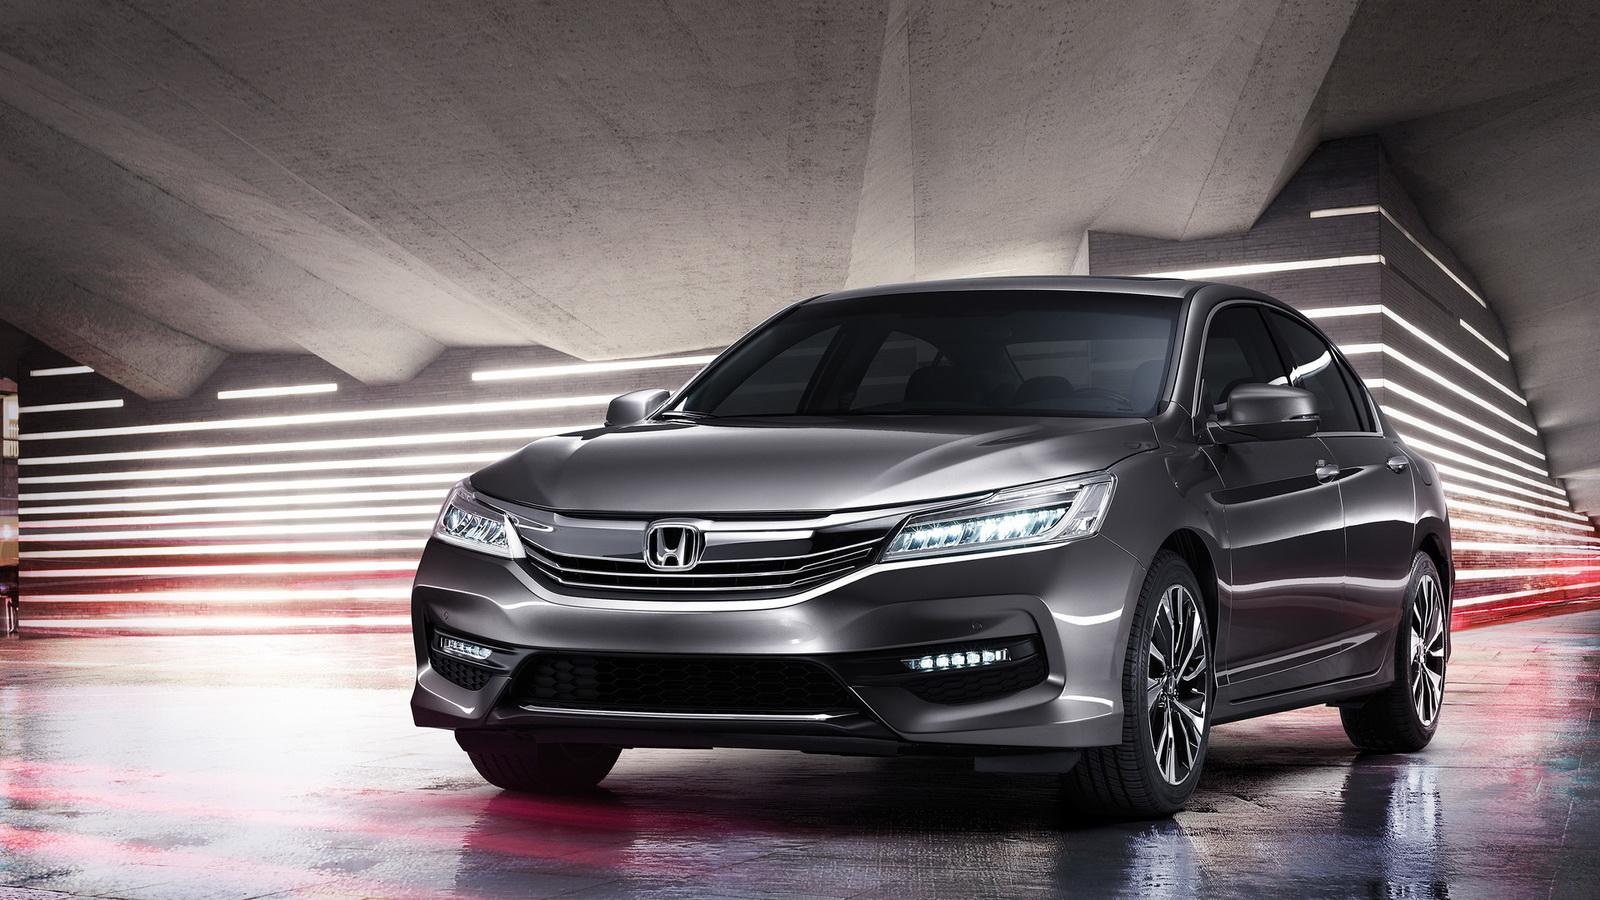 2016 honda accord sedan debuts in the philippines for Honda accord us news